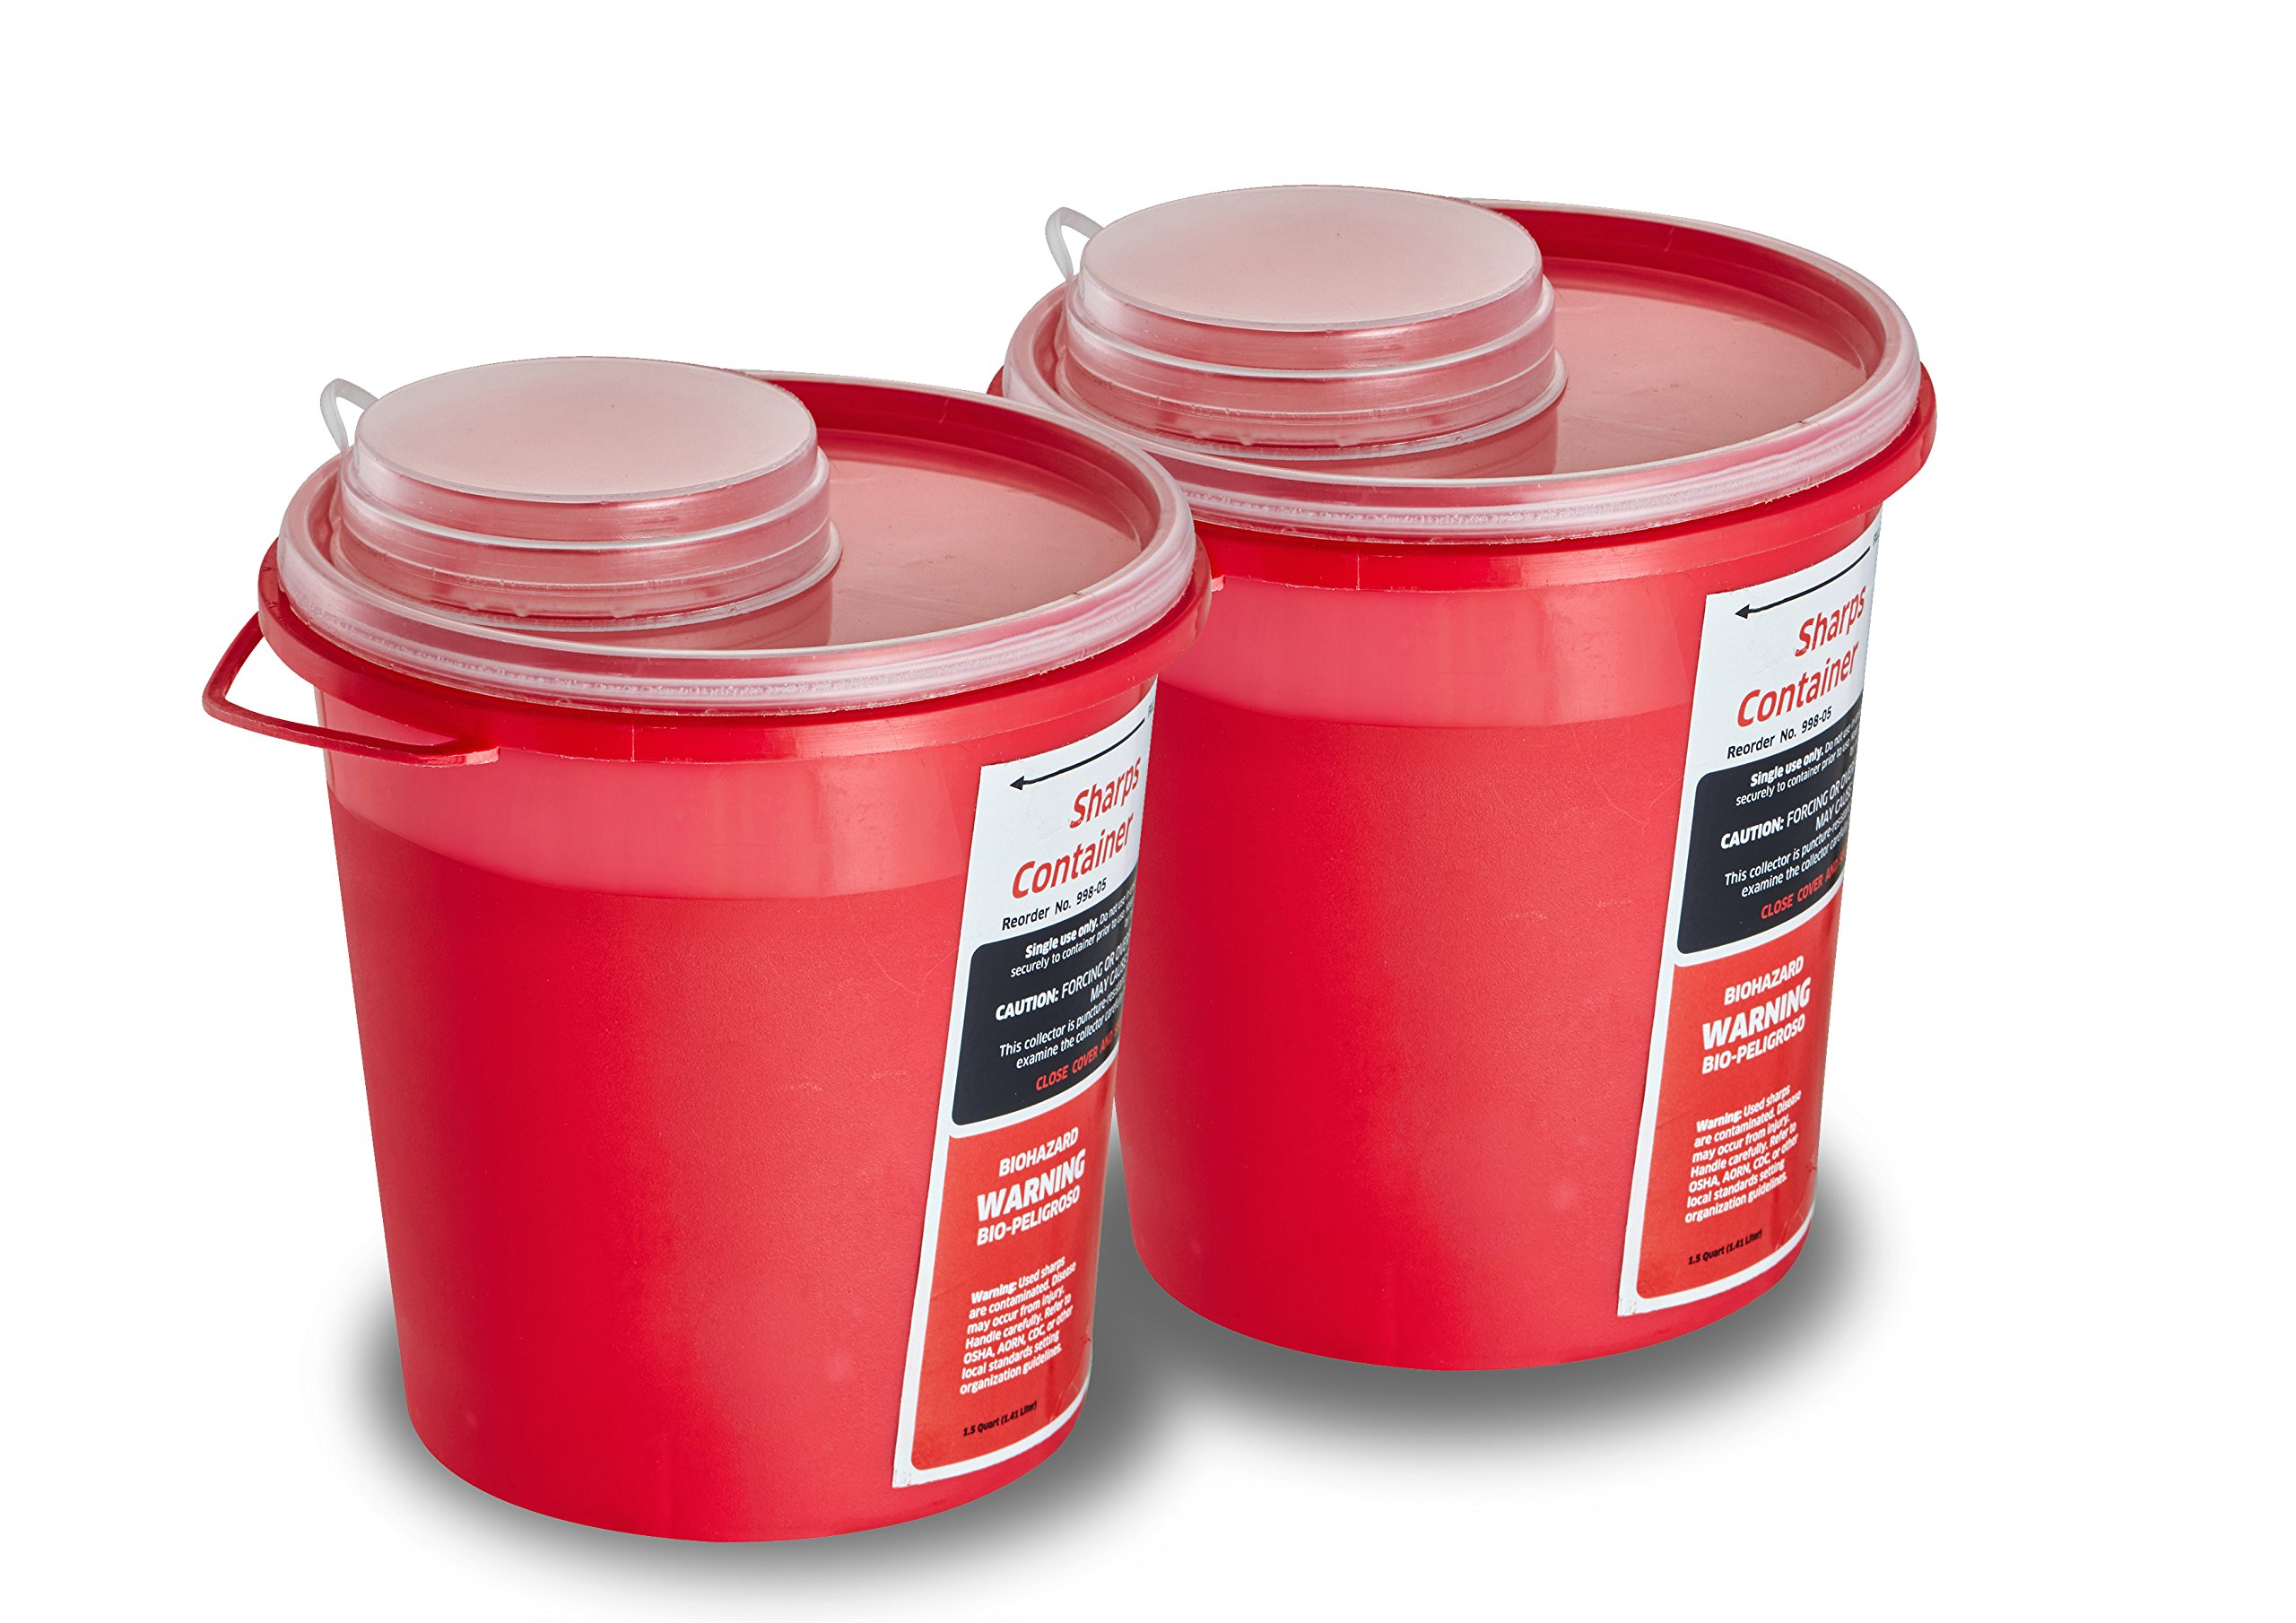 AdirMed Round Sharps & Needle Biohazard Disposal Container - 1.5 Quart - 2 Pack